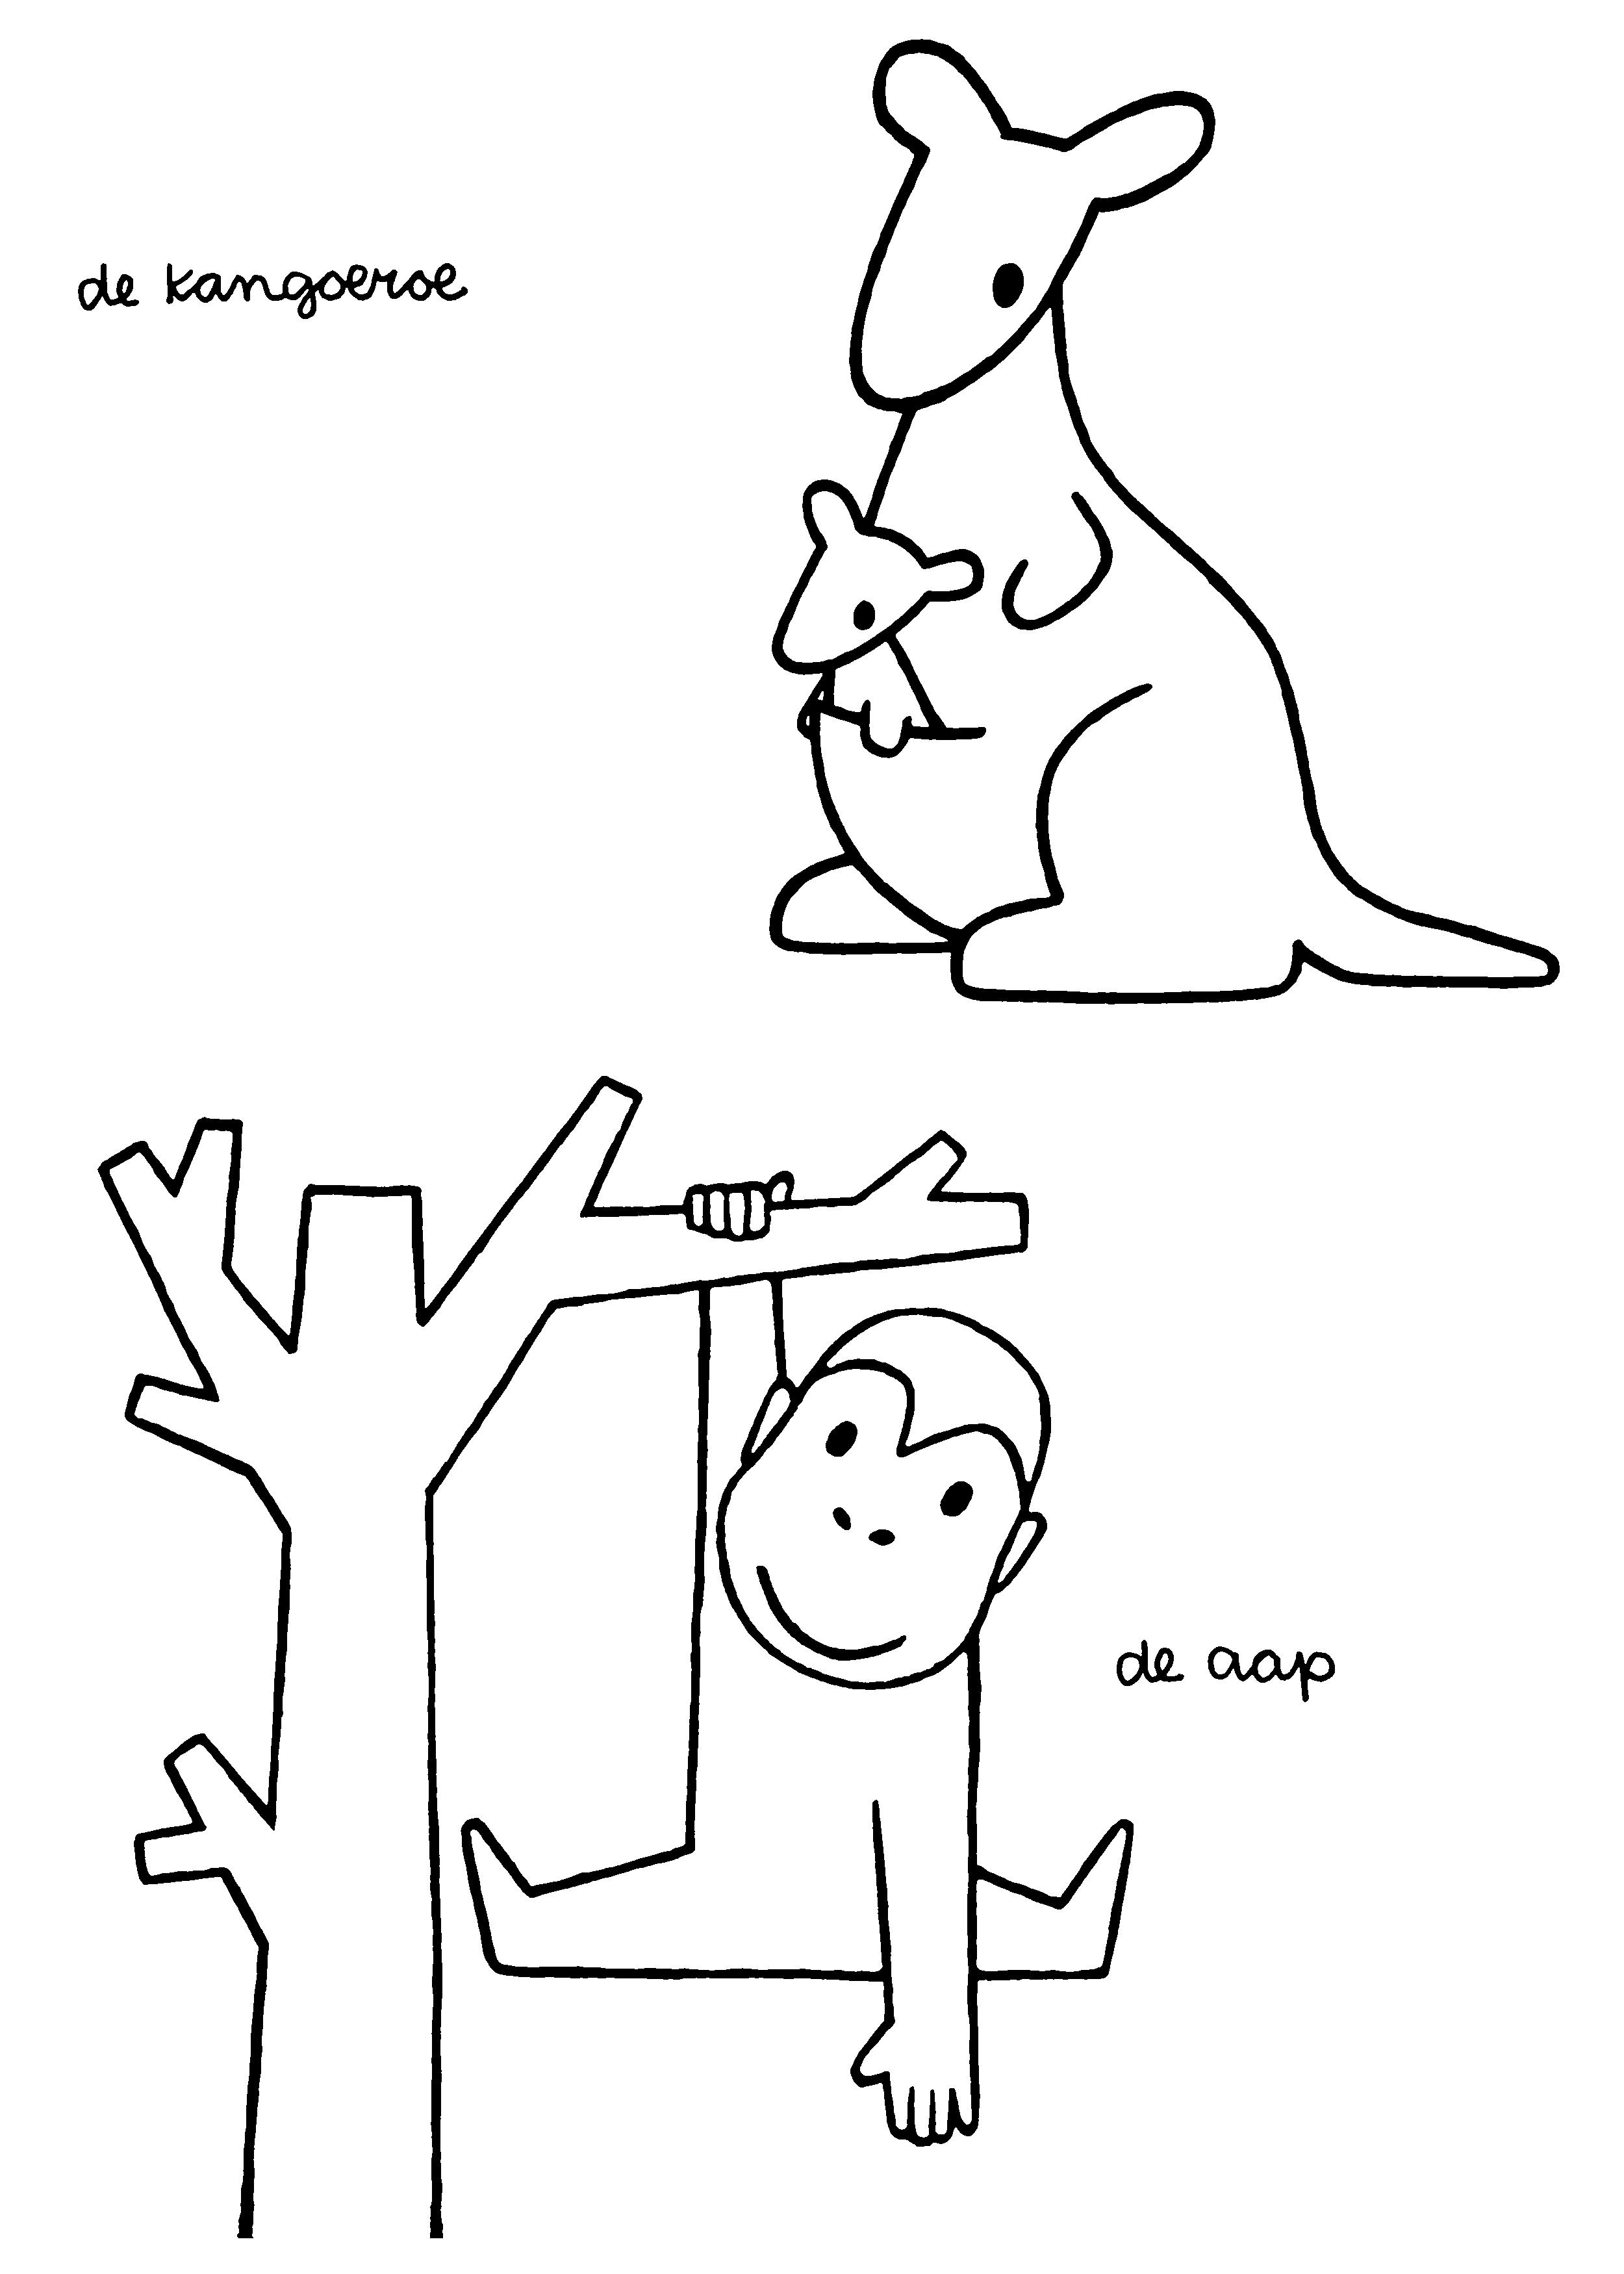 Kangaroo dick bruna all pinterest monkey doodle designs and